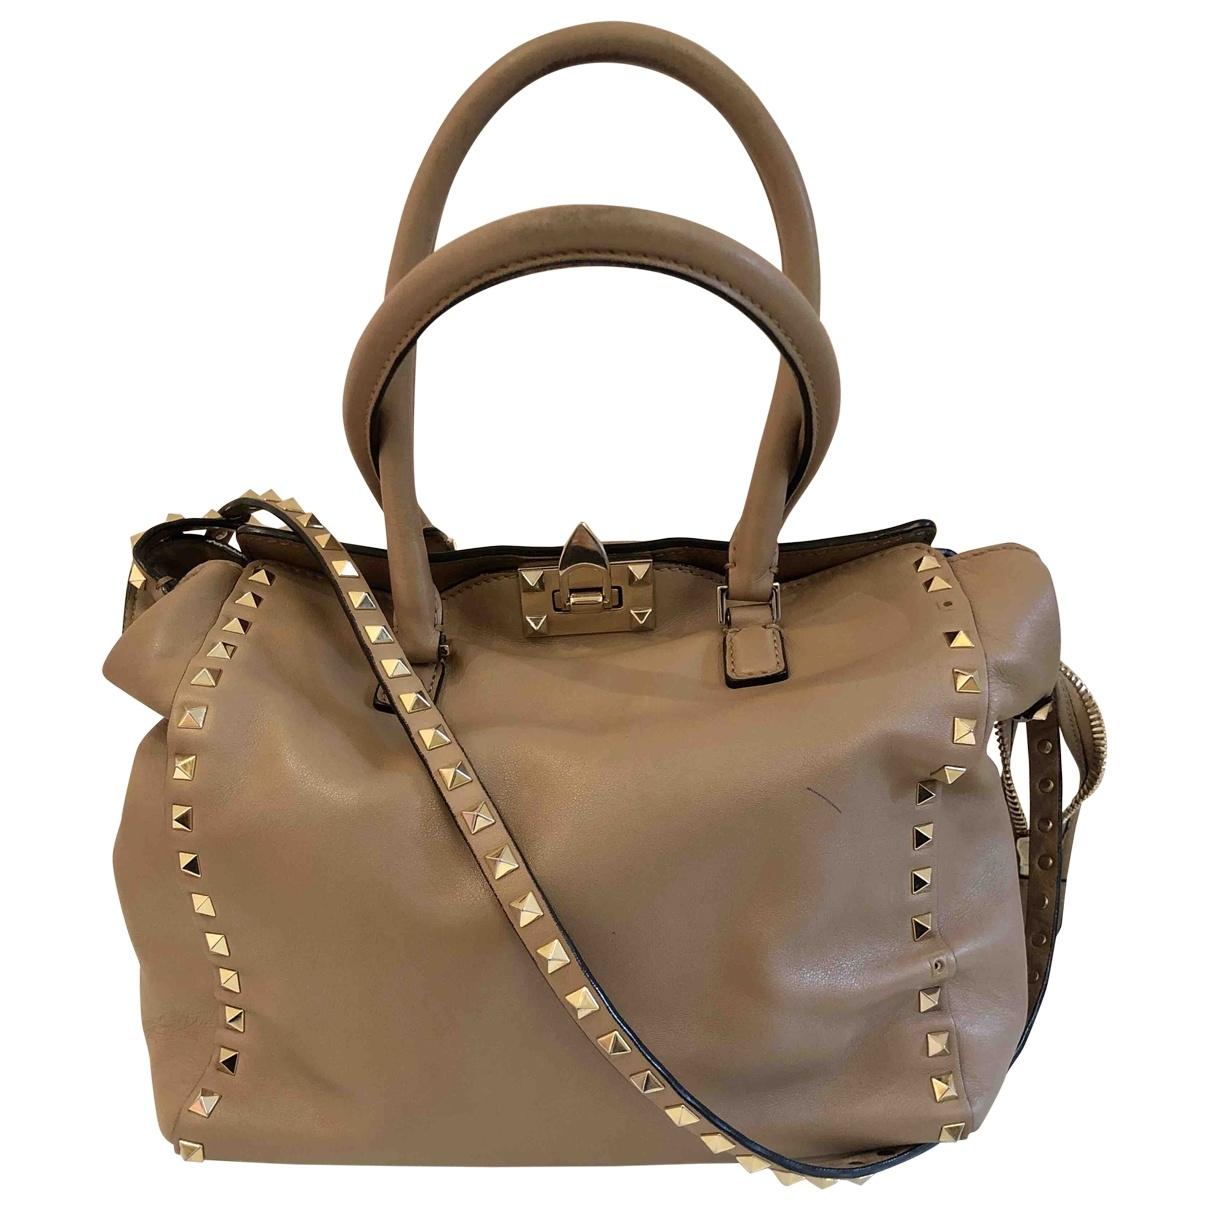 Valentino Garavani Rockstud Beige Leather handbag for Women \N